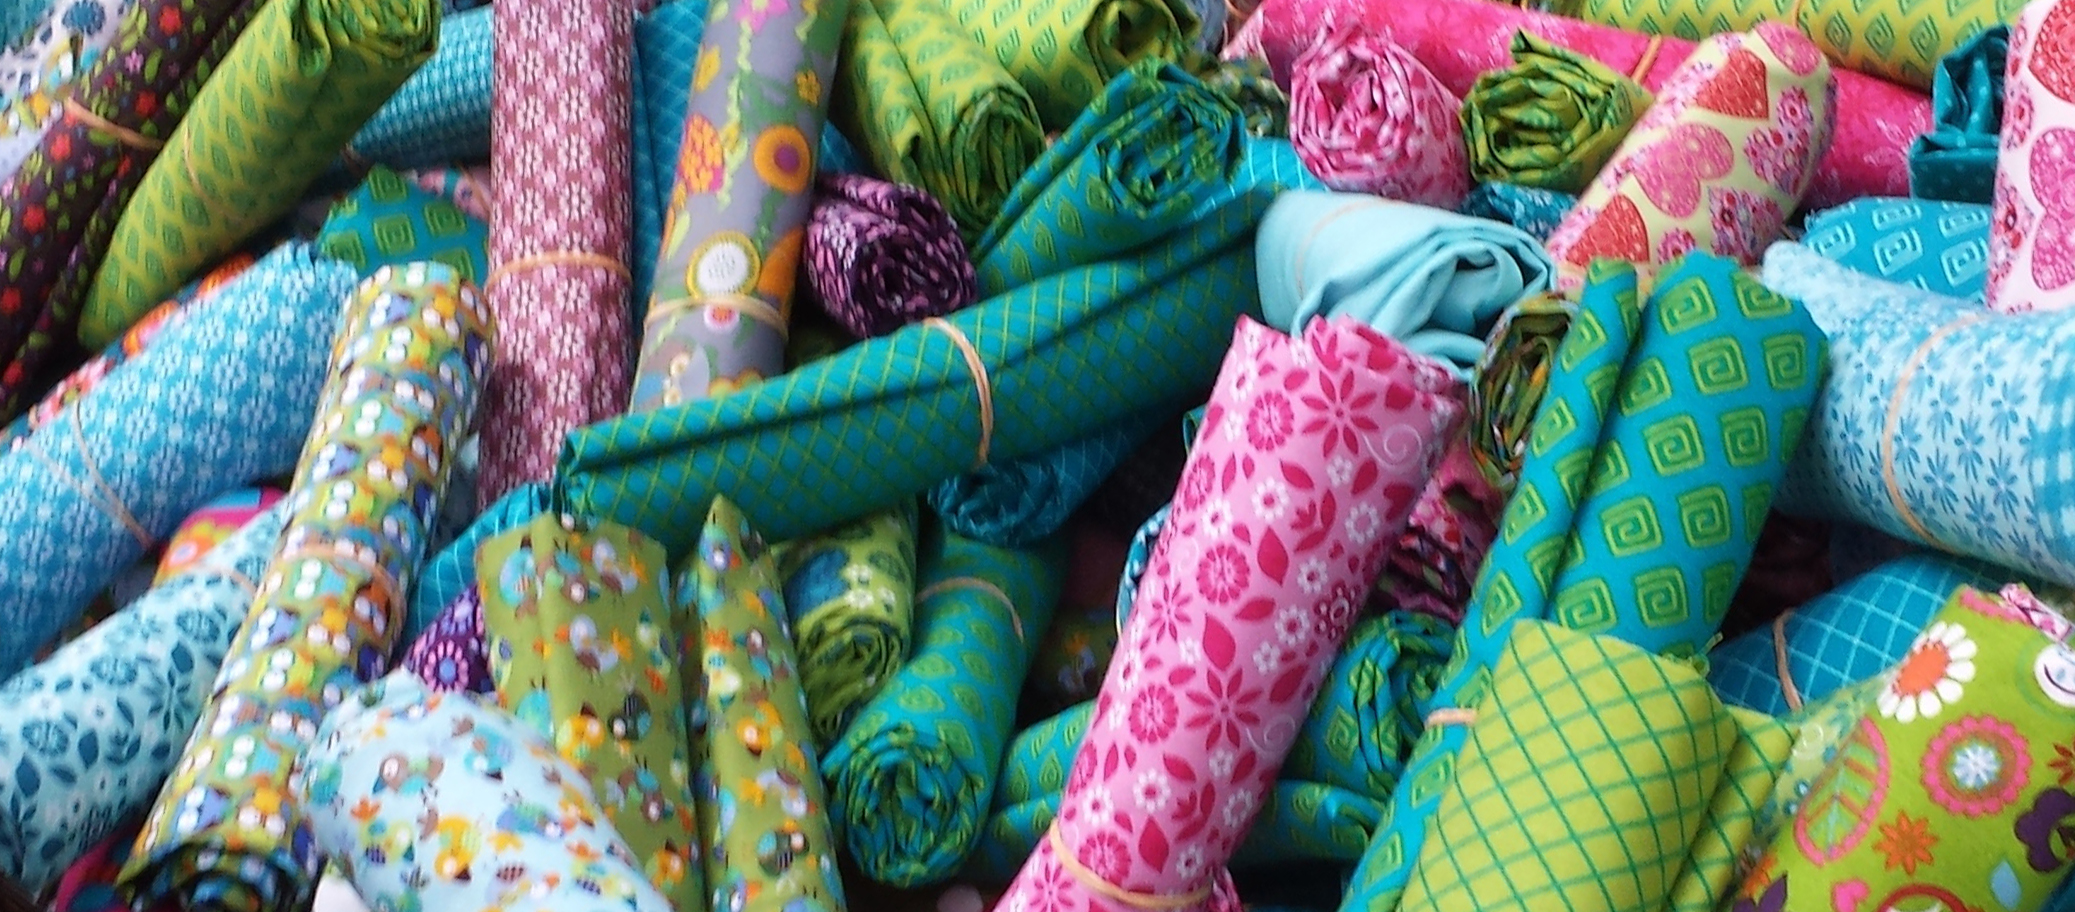 Stoffen spektakel march aux tissus de reims ma maman la f e - Tissus bohemes colores ...